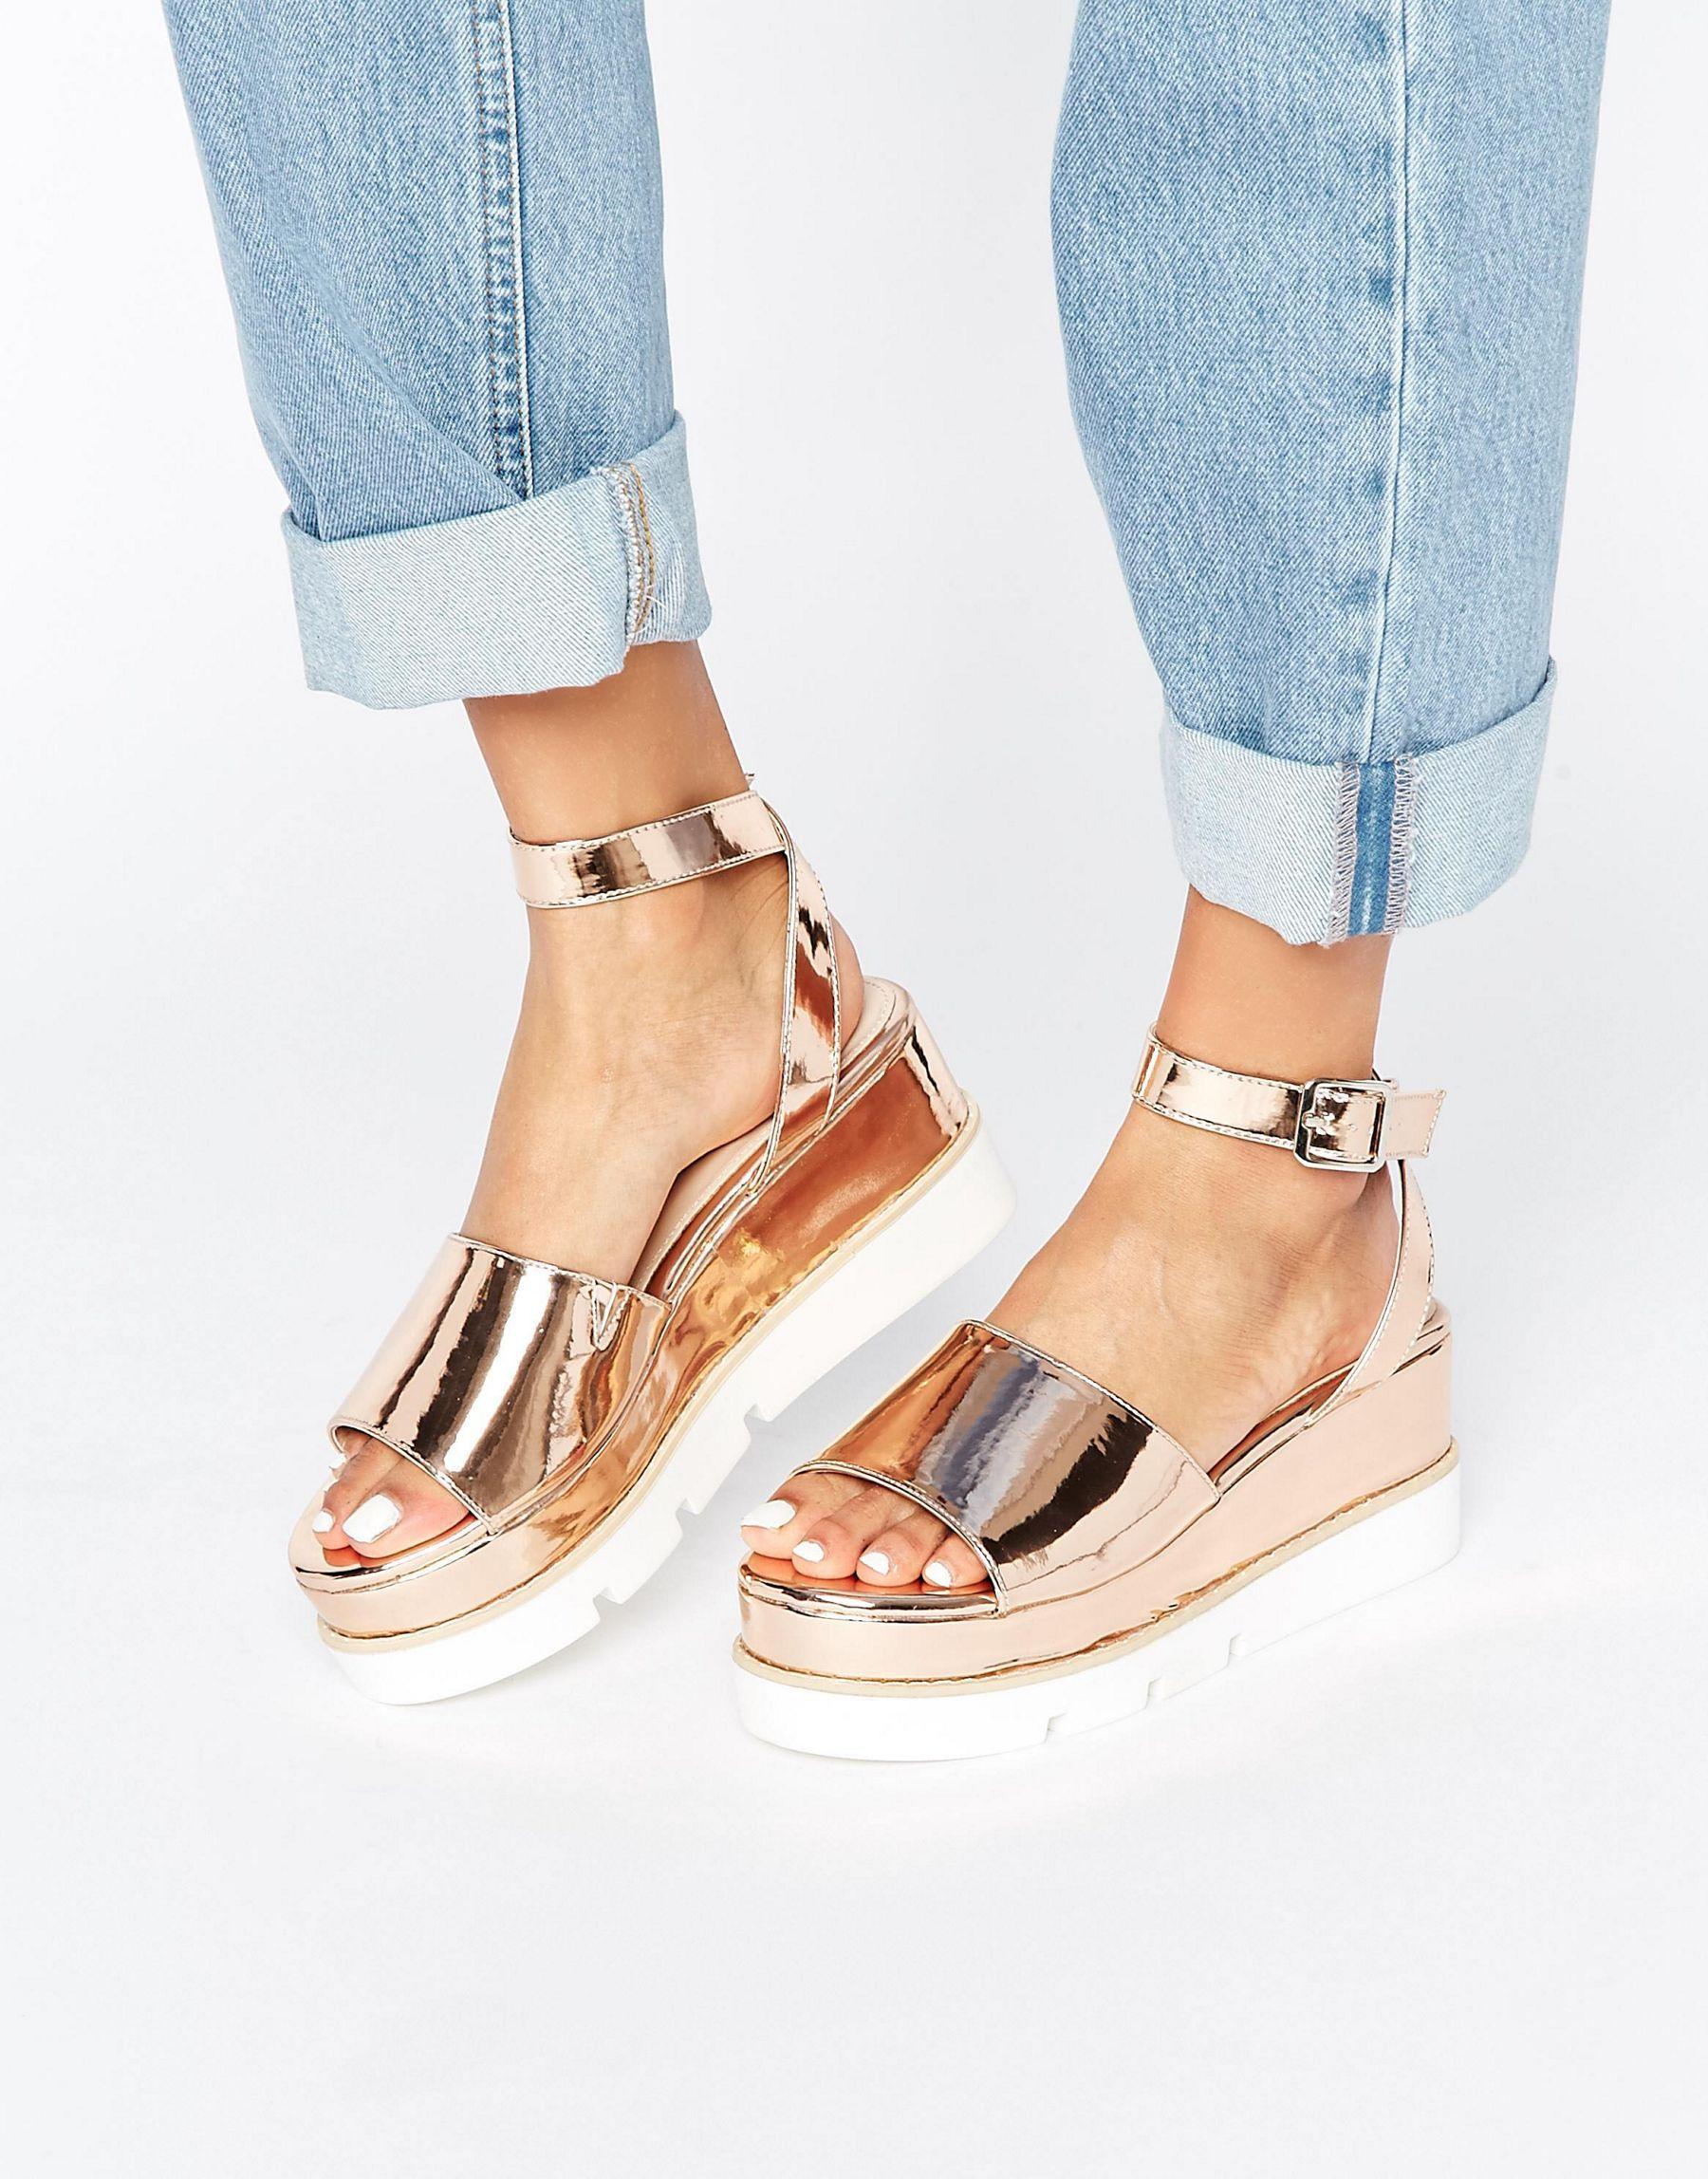 717a3128f73 Lyst - ASOS Tierney Wedge Sandals in Metallic